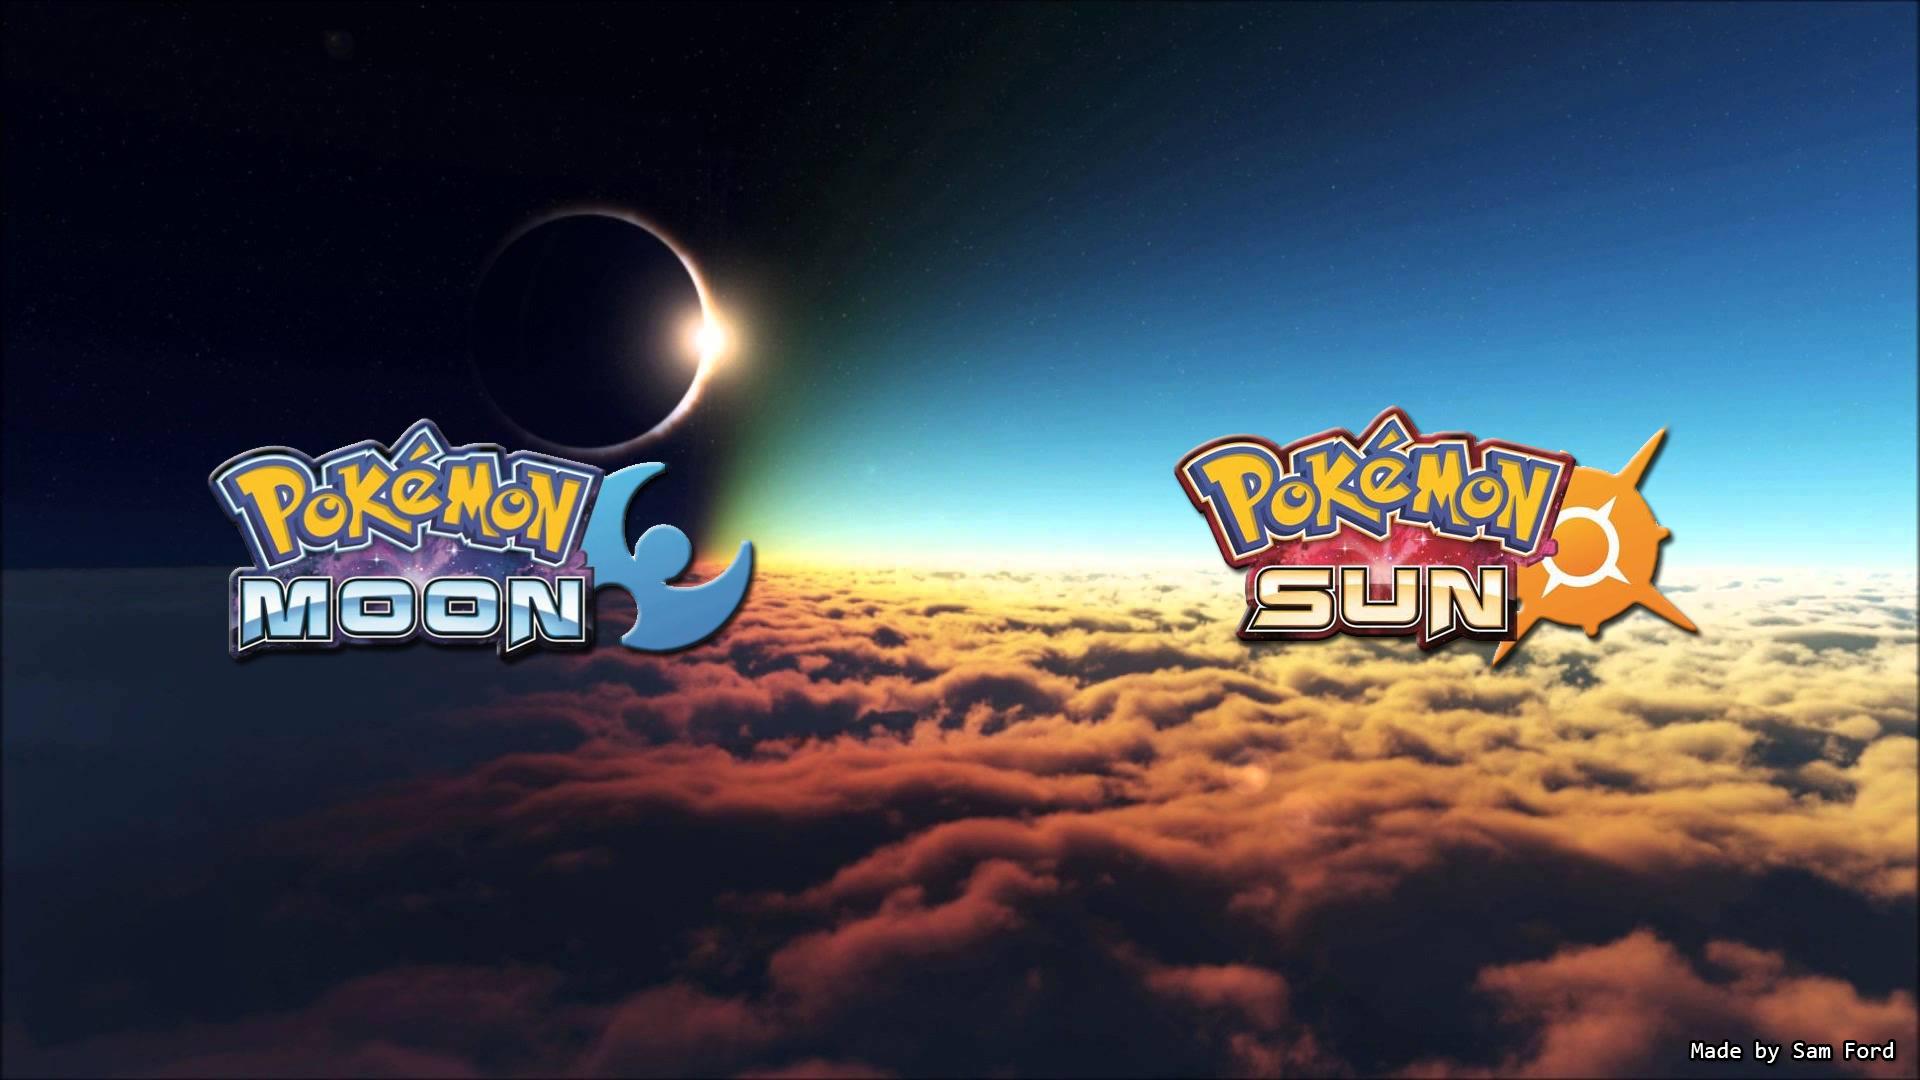 Pokemon Sun And Moon Wallpaper: Pokemon Moon And Sun Desktop Wallpaper (Sam Ford) By